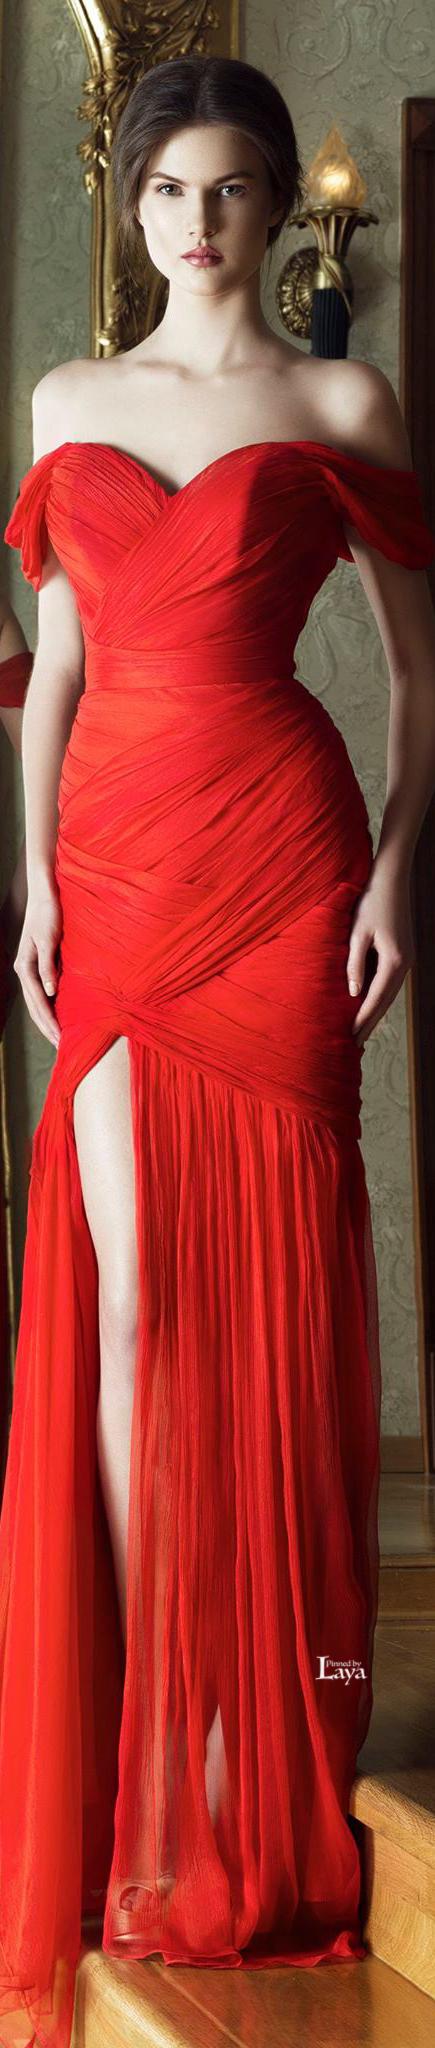 Pin by linda sims on ravishing red pinterest gowns